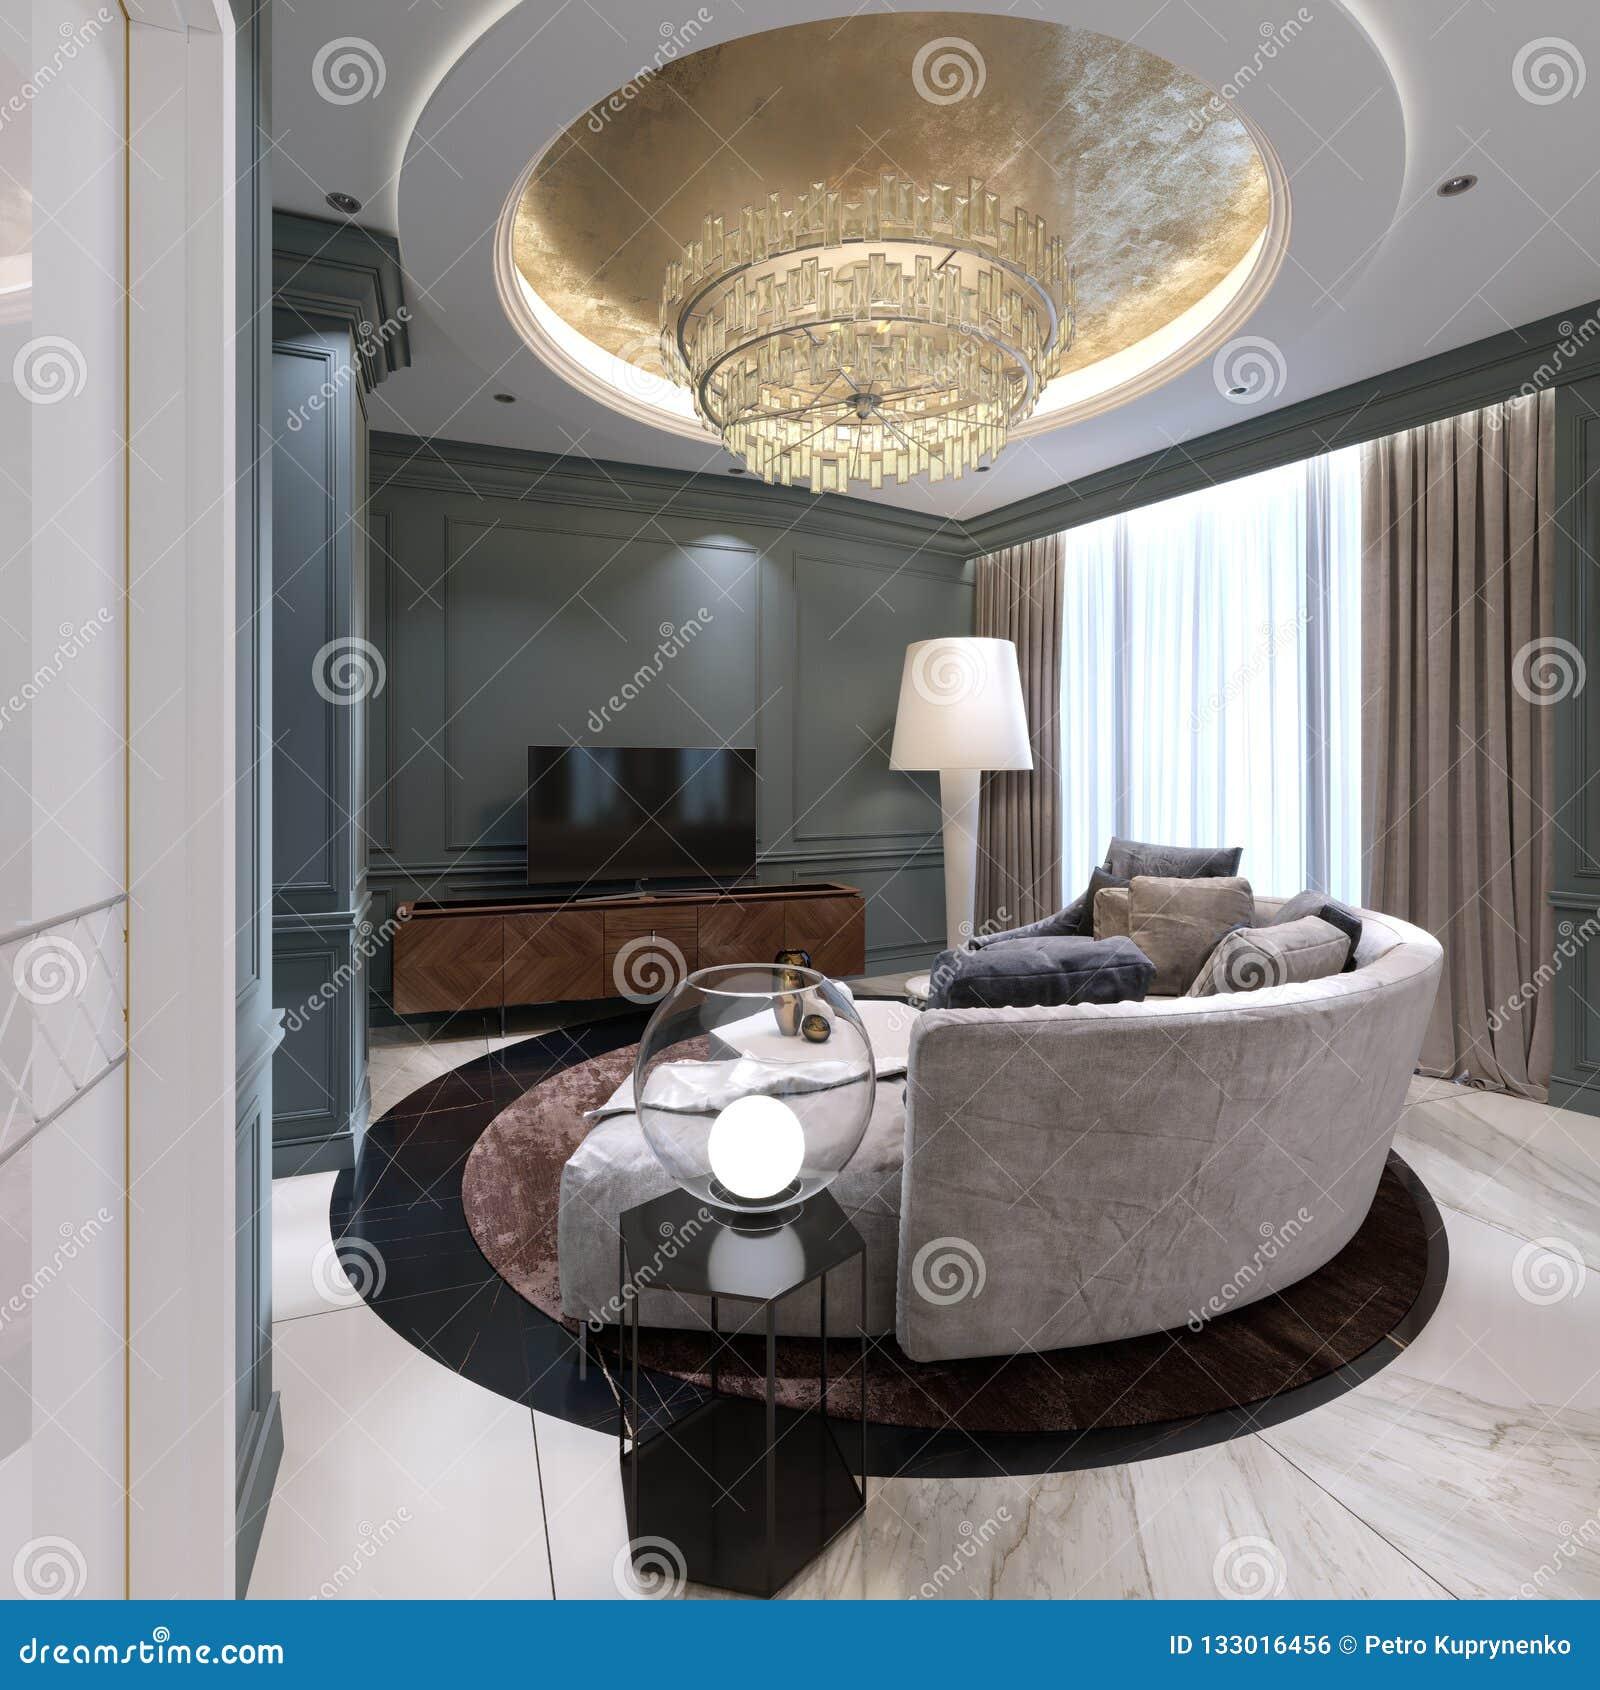 Semicircular Ktv Room Interior Design: A Small Living Room With A Semi-circular Sofa And A